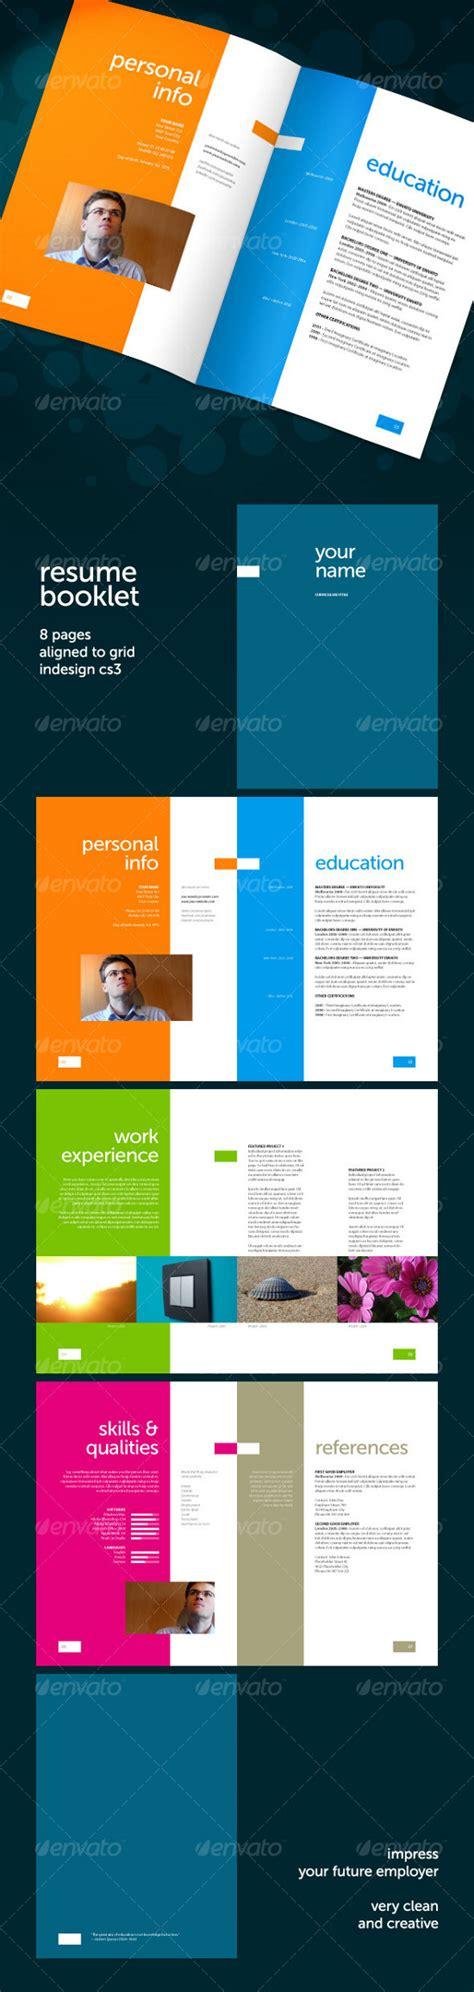 cv booklet design get your dream job 15 clean elegant resume templates